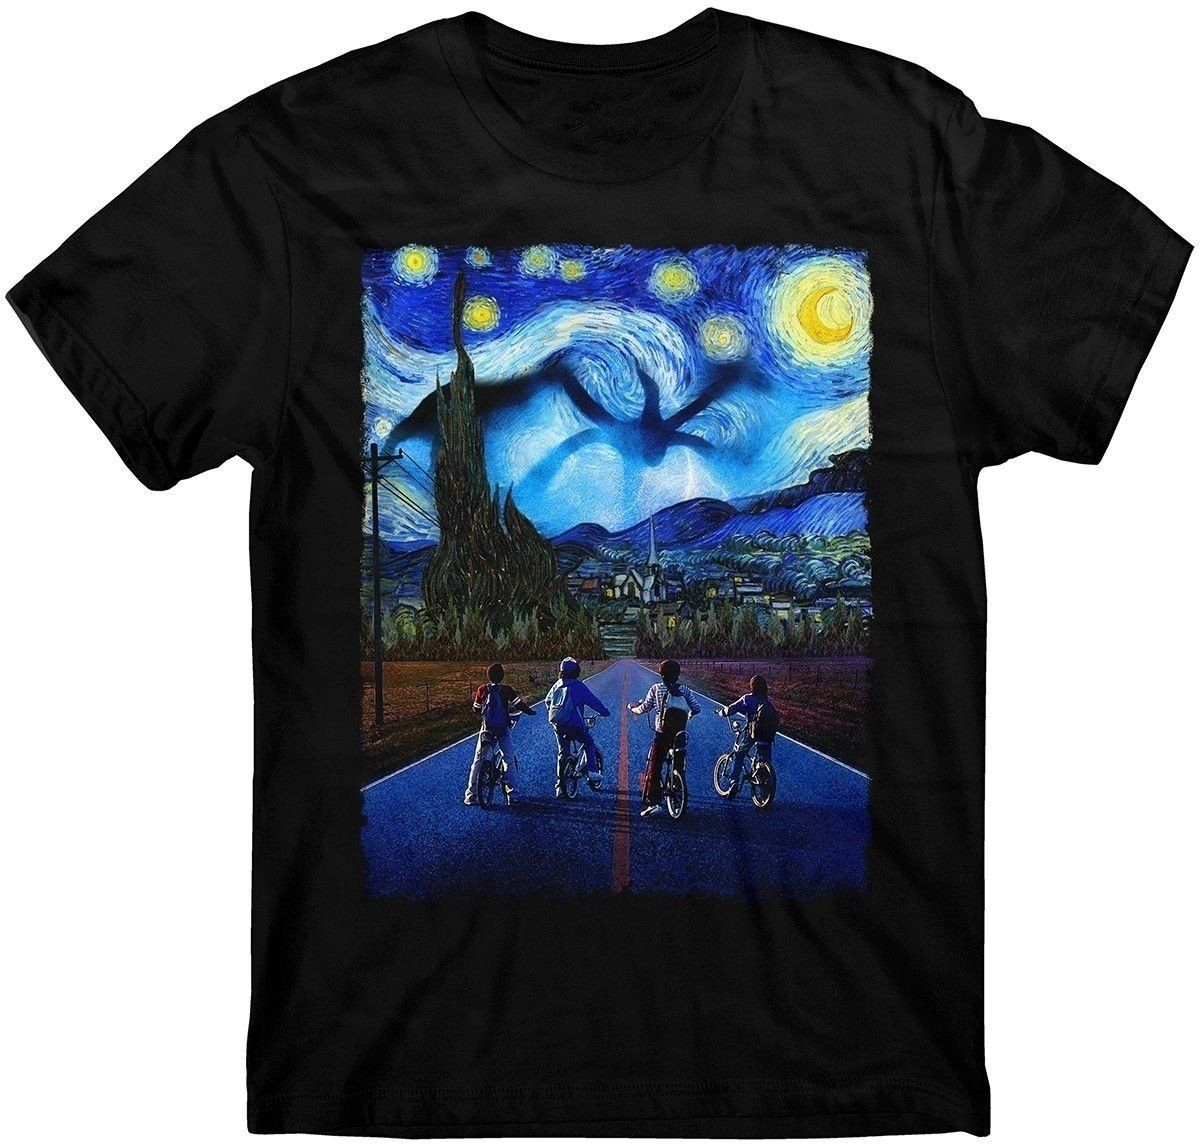 Stranger Things T Shirt Starry Night T Shirt Demogorgon Eleven Steve T Shirt Print T Shirts For Man Casual Short Sleeves In 2021 Stranger Things Tshirt Stranger Things Outfit Printed Shirts [ 1147 x 1200 Pixel ]